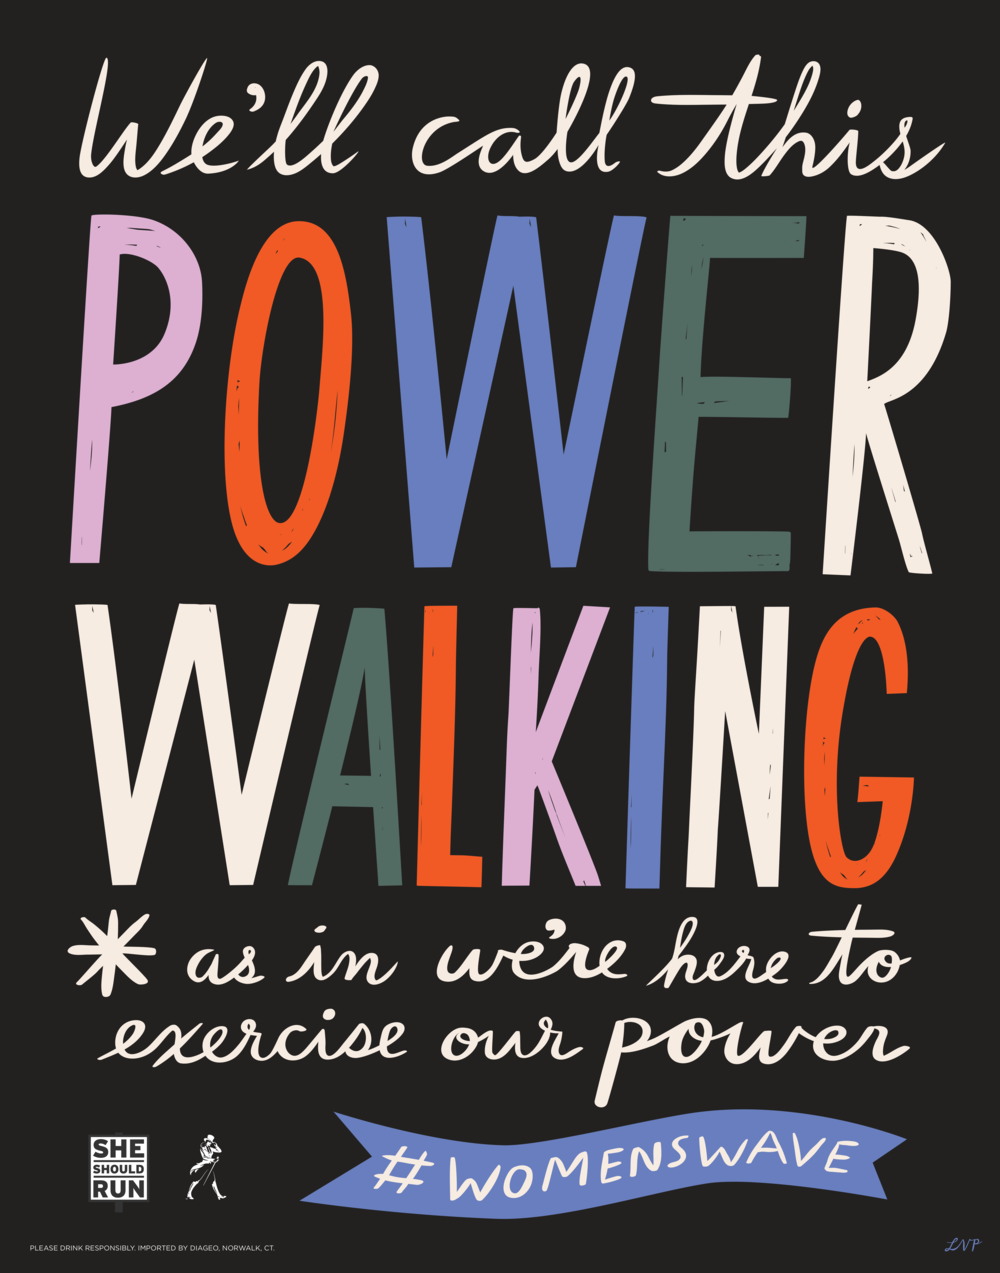 LVPowerWalking_Poster.png